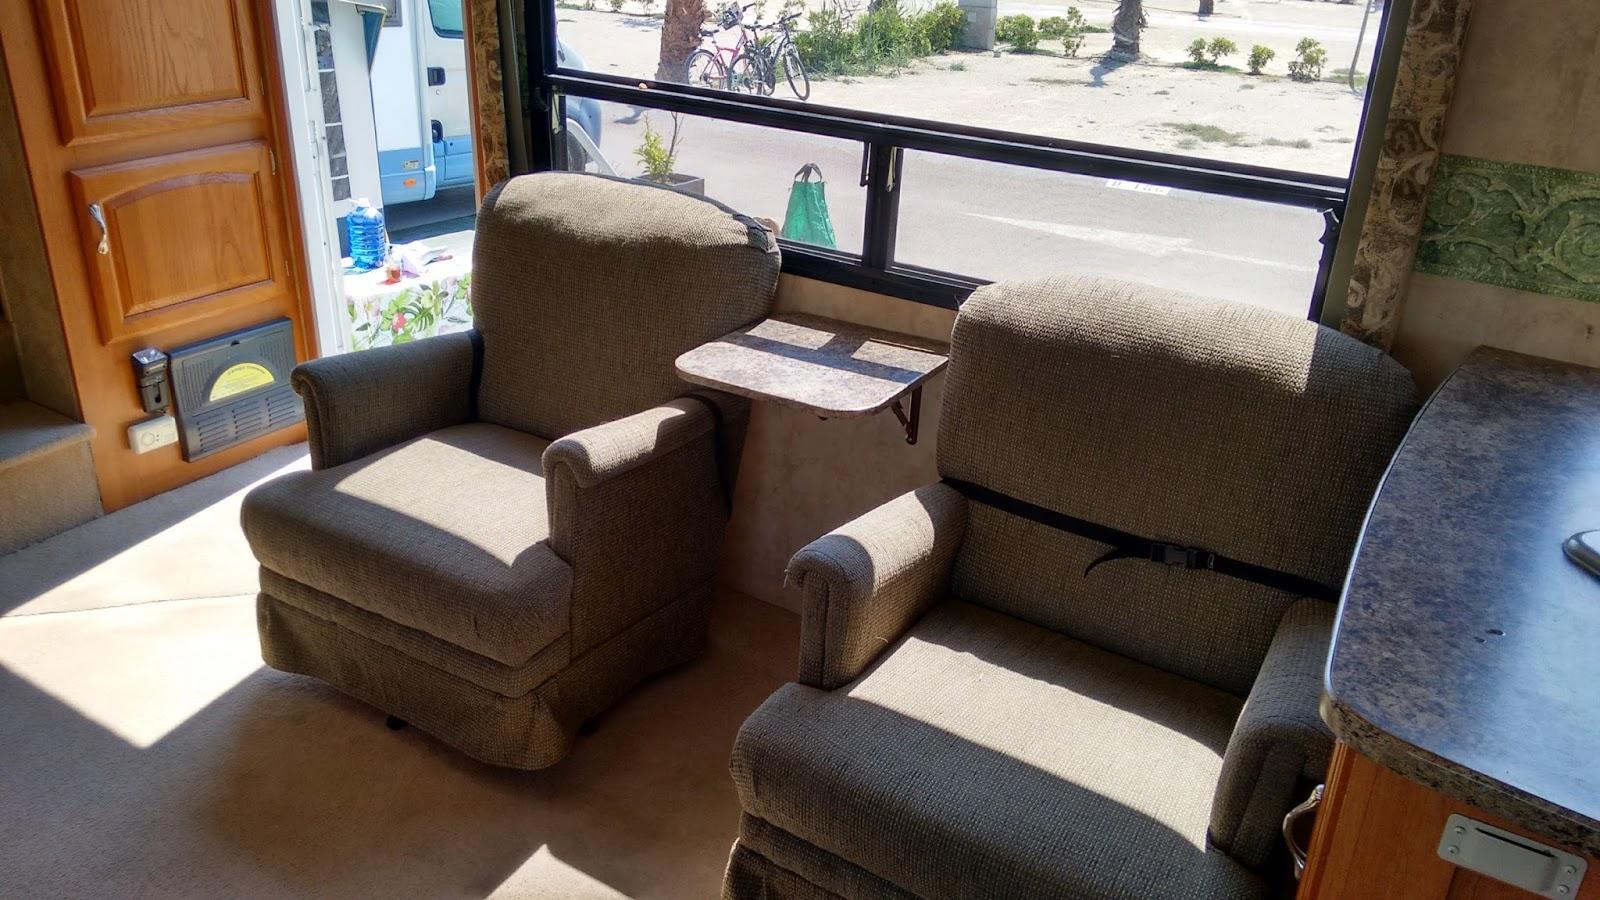 sofa beds costa blanca big island greige european transport towing delivery storage